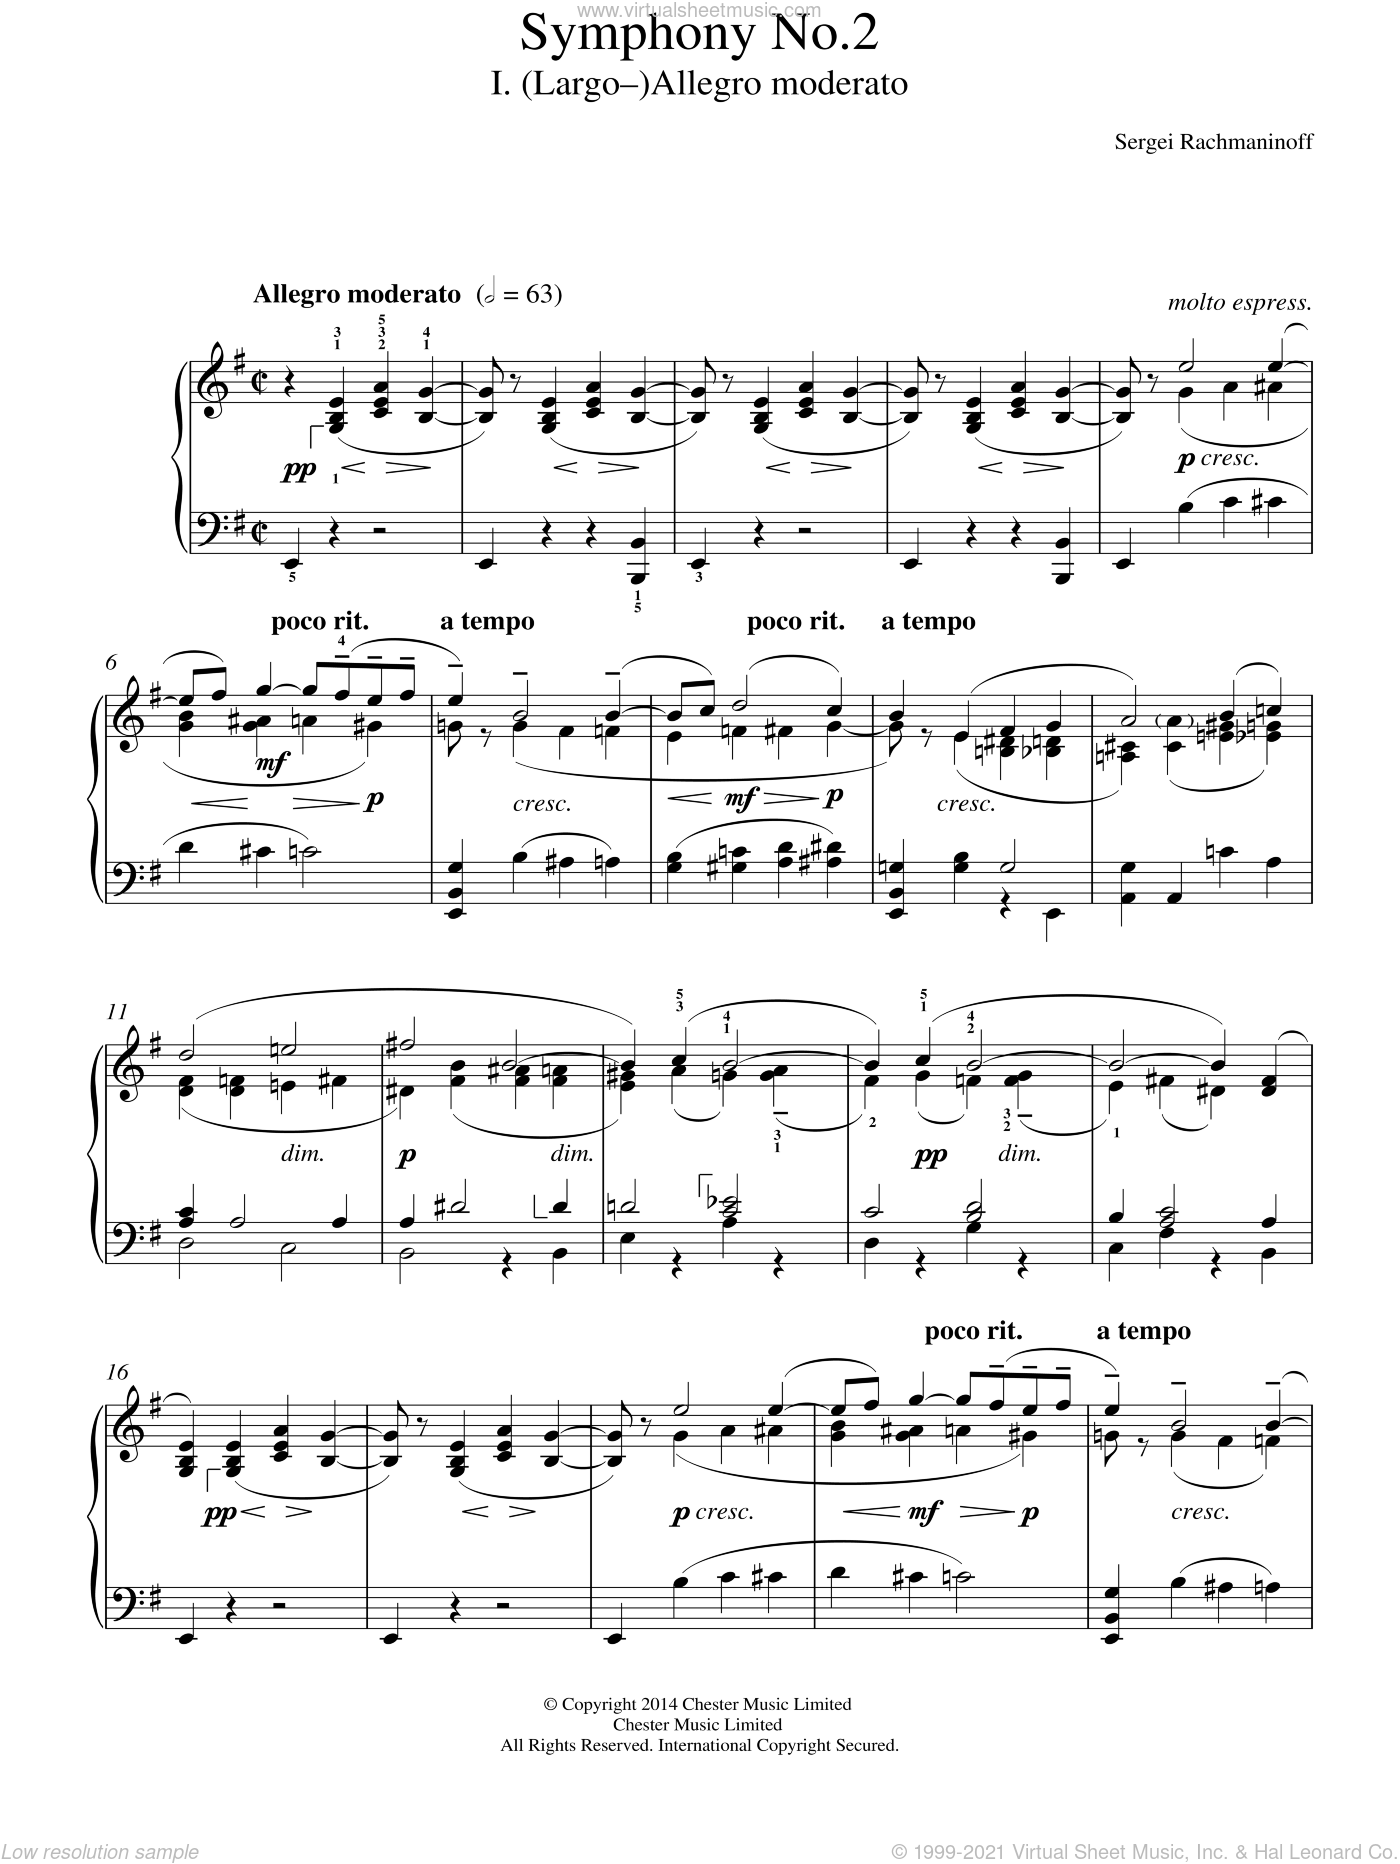 Symphony No.2 - 1st Movement sheet music for piano solo by Serjeij Rachmaninoff, classical score, intermediate skill level